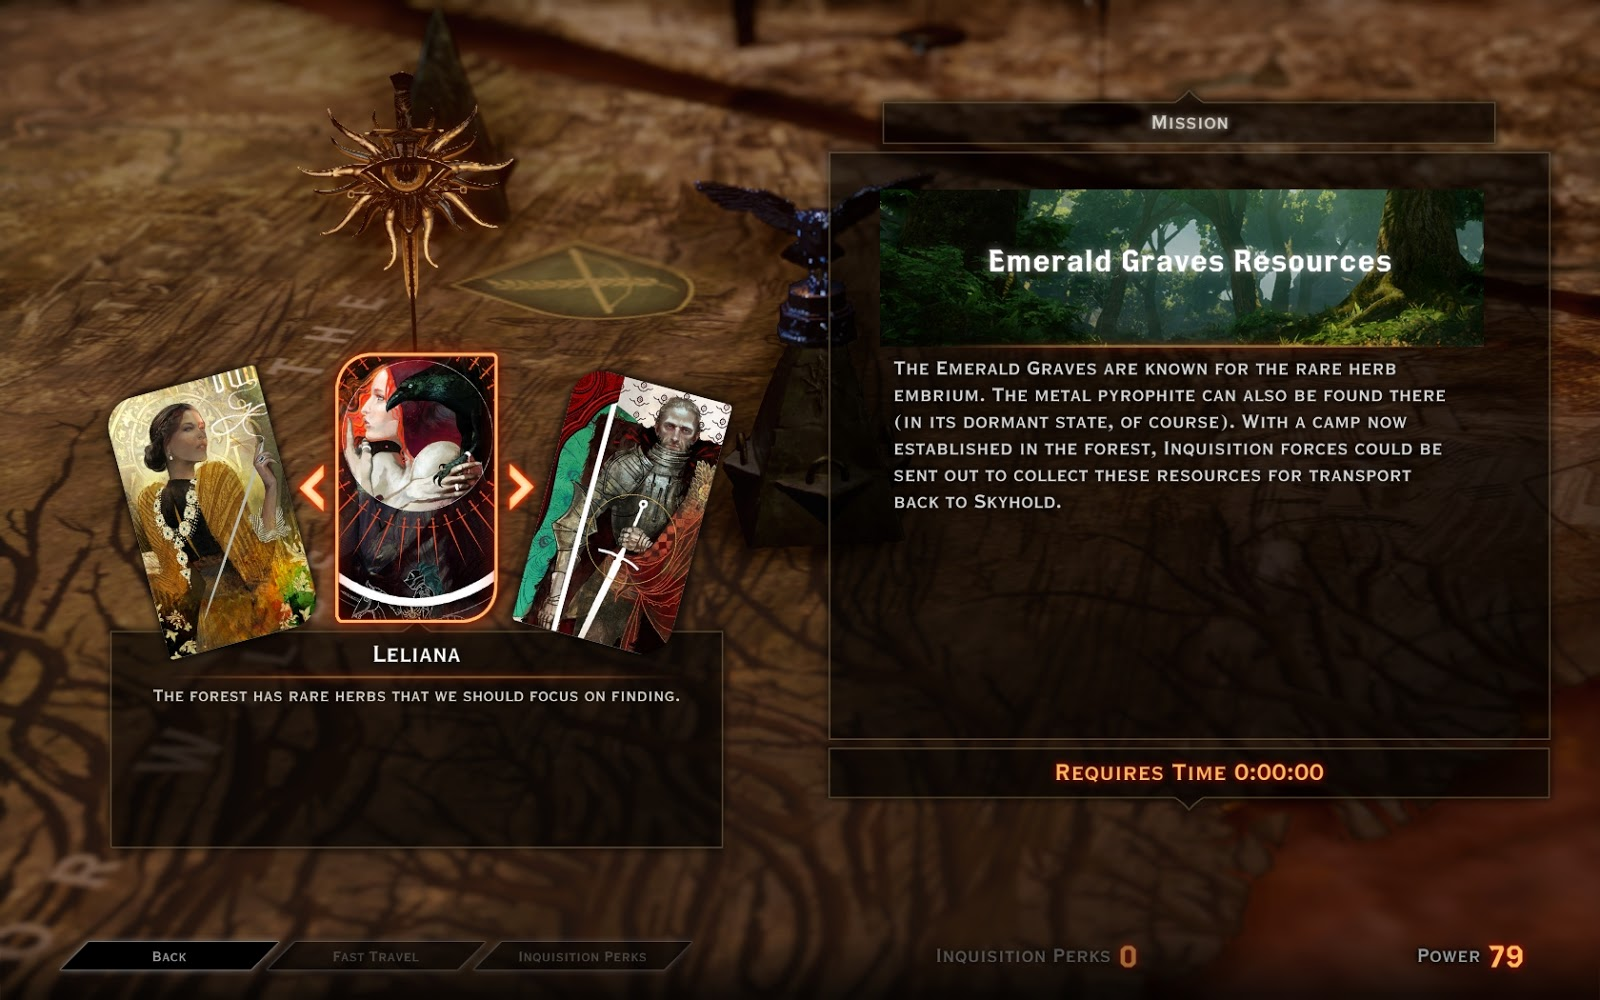 Dragon Age Inquisition Mods Cheats Console Commands